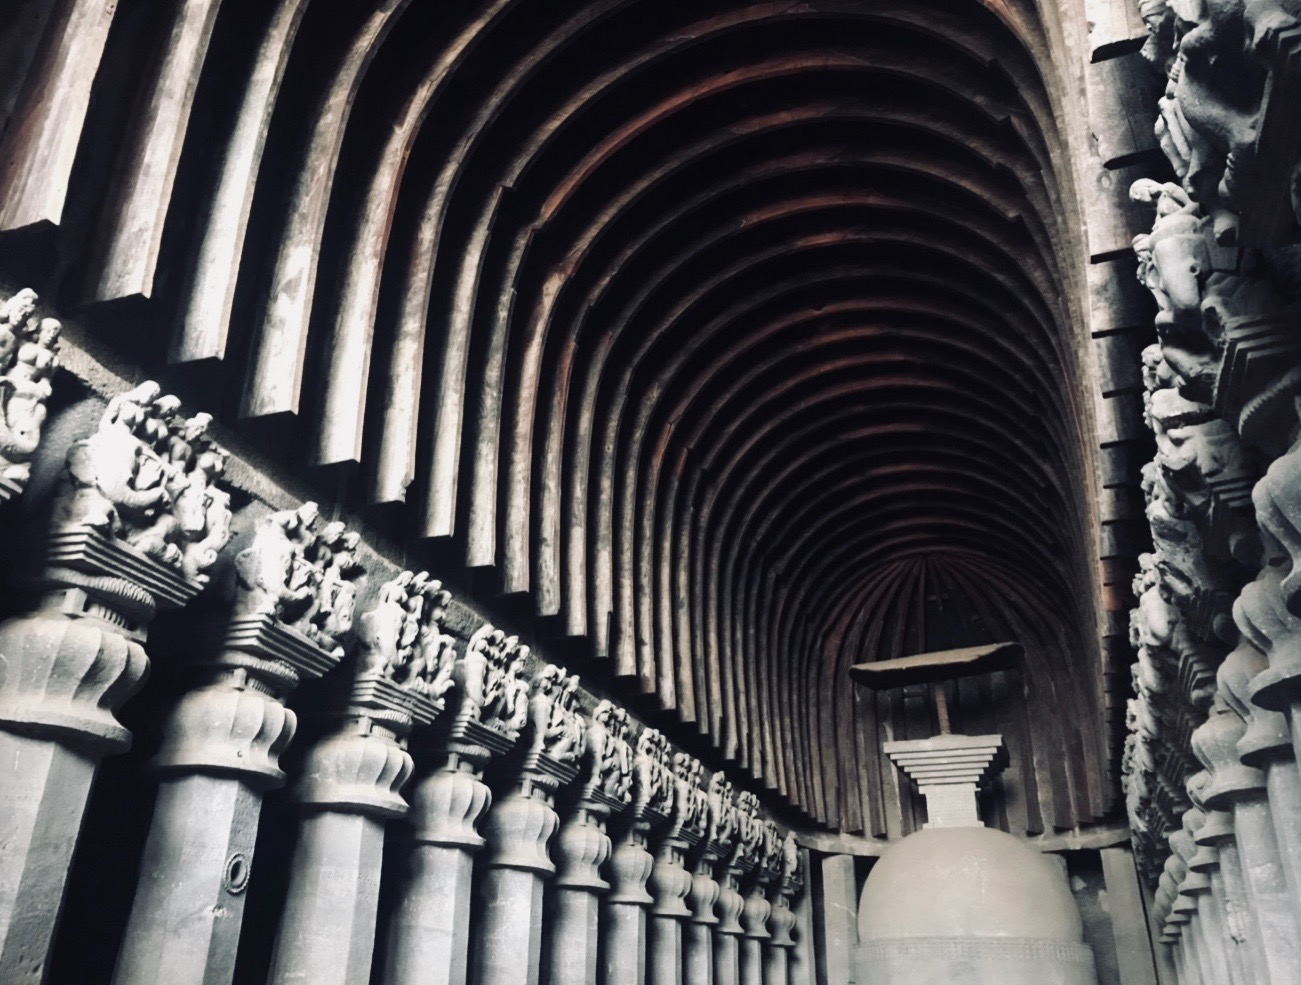 Chaitya caves showcasing buddhist architecture, 2nd Century BC ( India ) — Photographed by Shristi Sainani